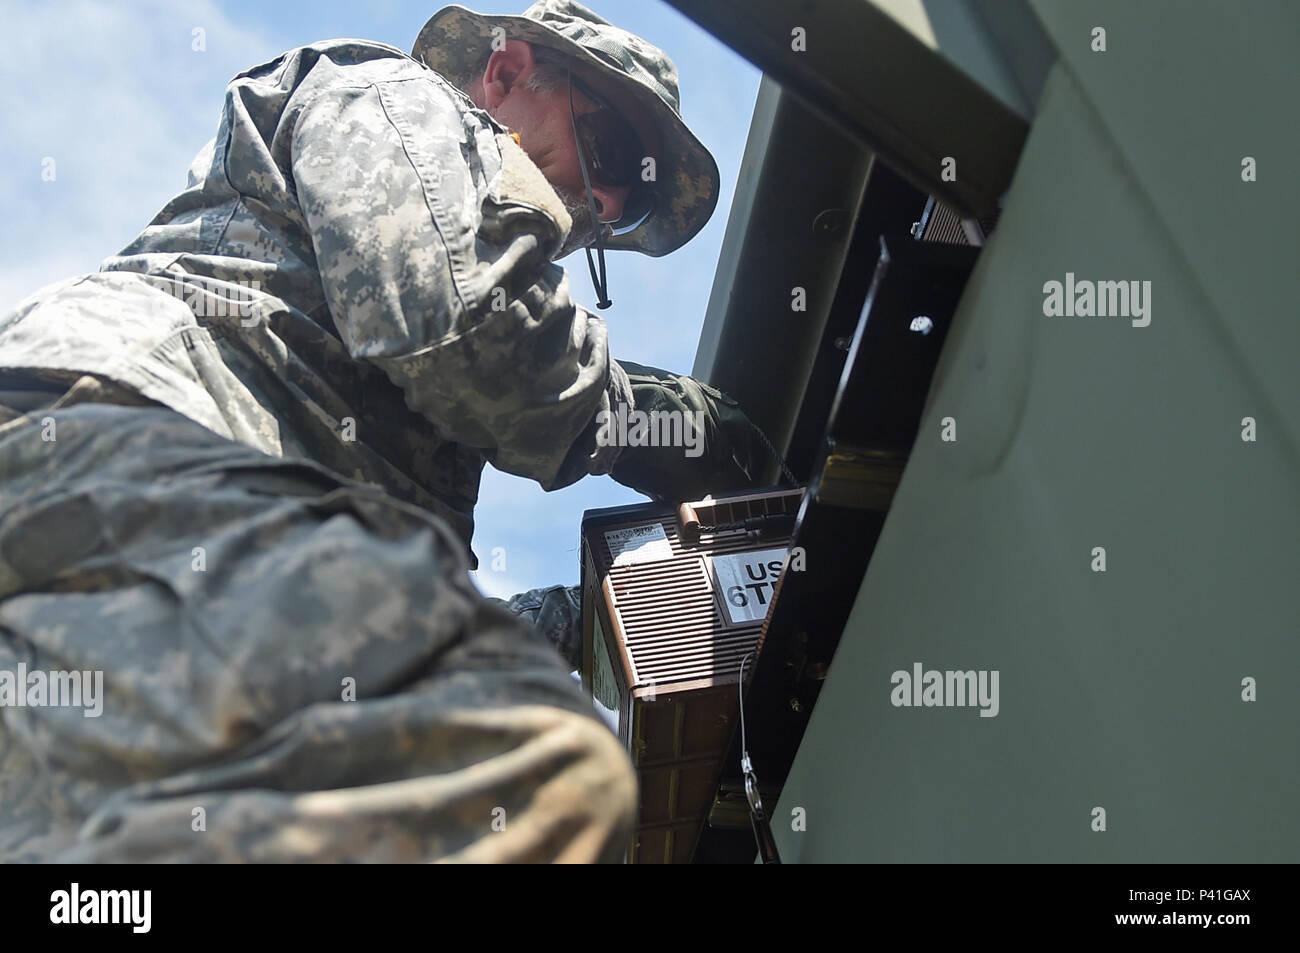 Atalas for battur i militar marinbas